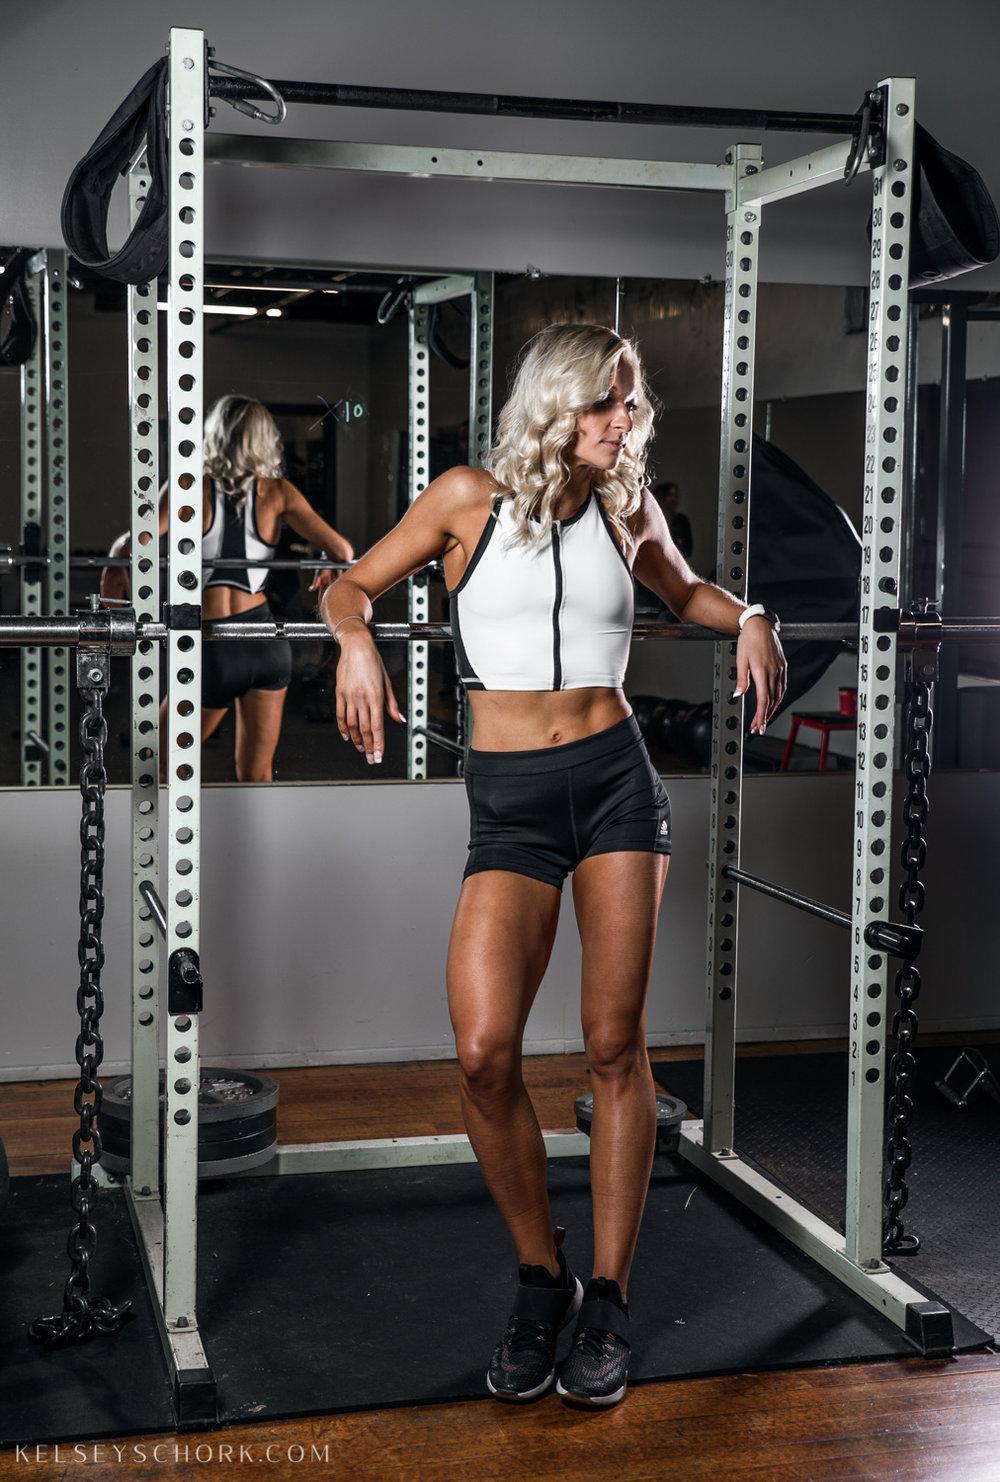 Bikini_Fitness_Jaimie_Buffalo-14.jpg